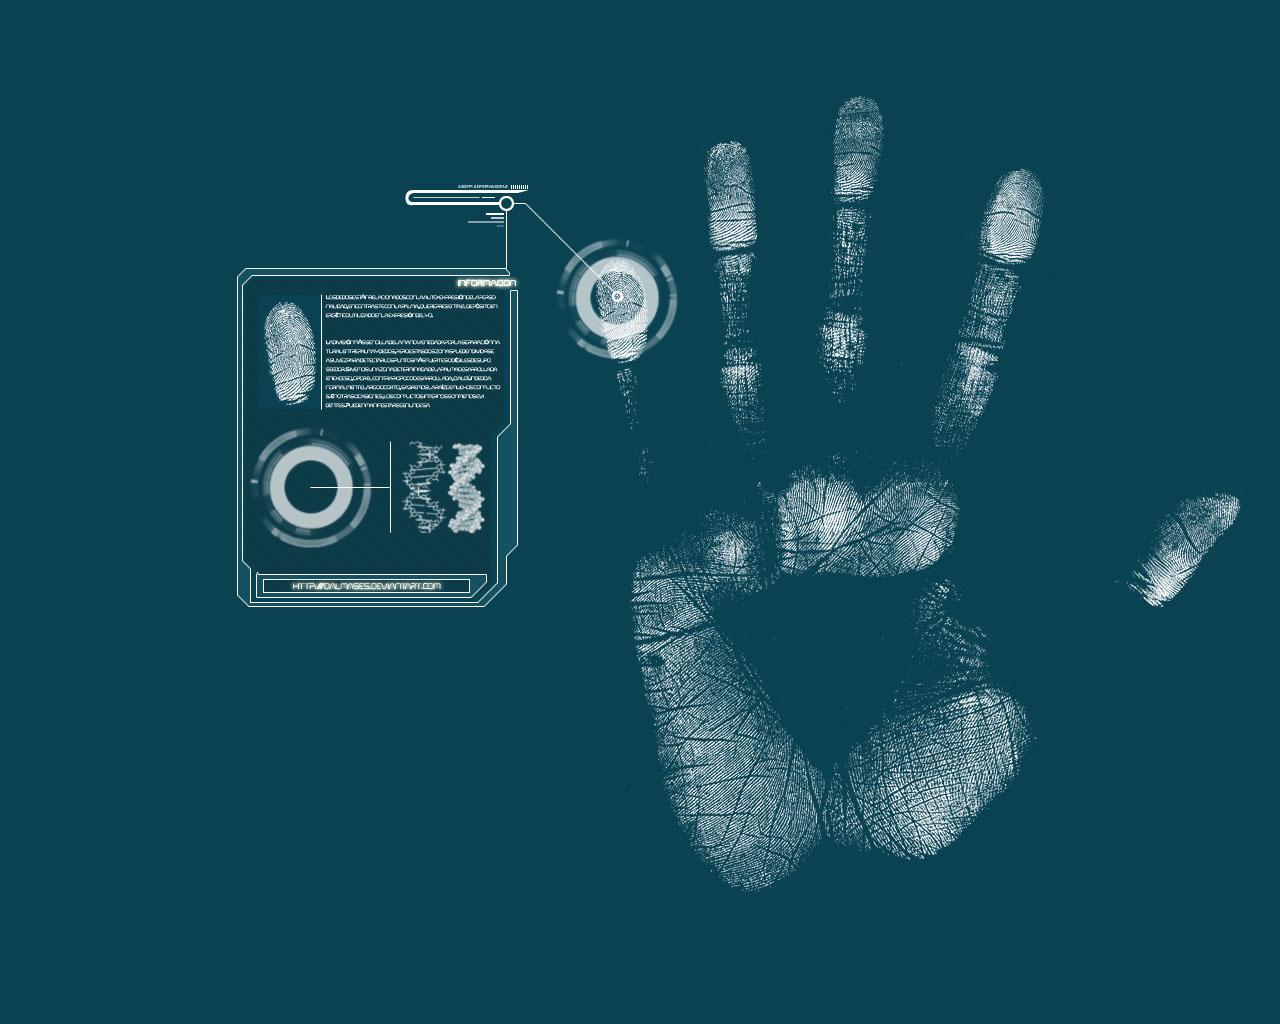 Wallpaper 1280x1024 Hands Scanners Fingerprints Databases Palm 1280x1024